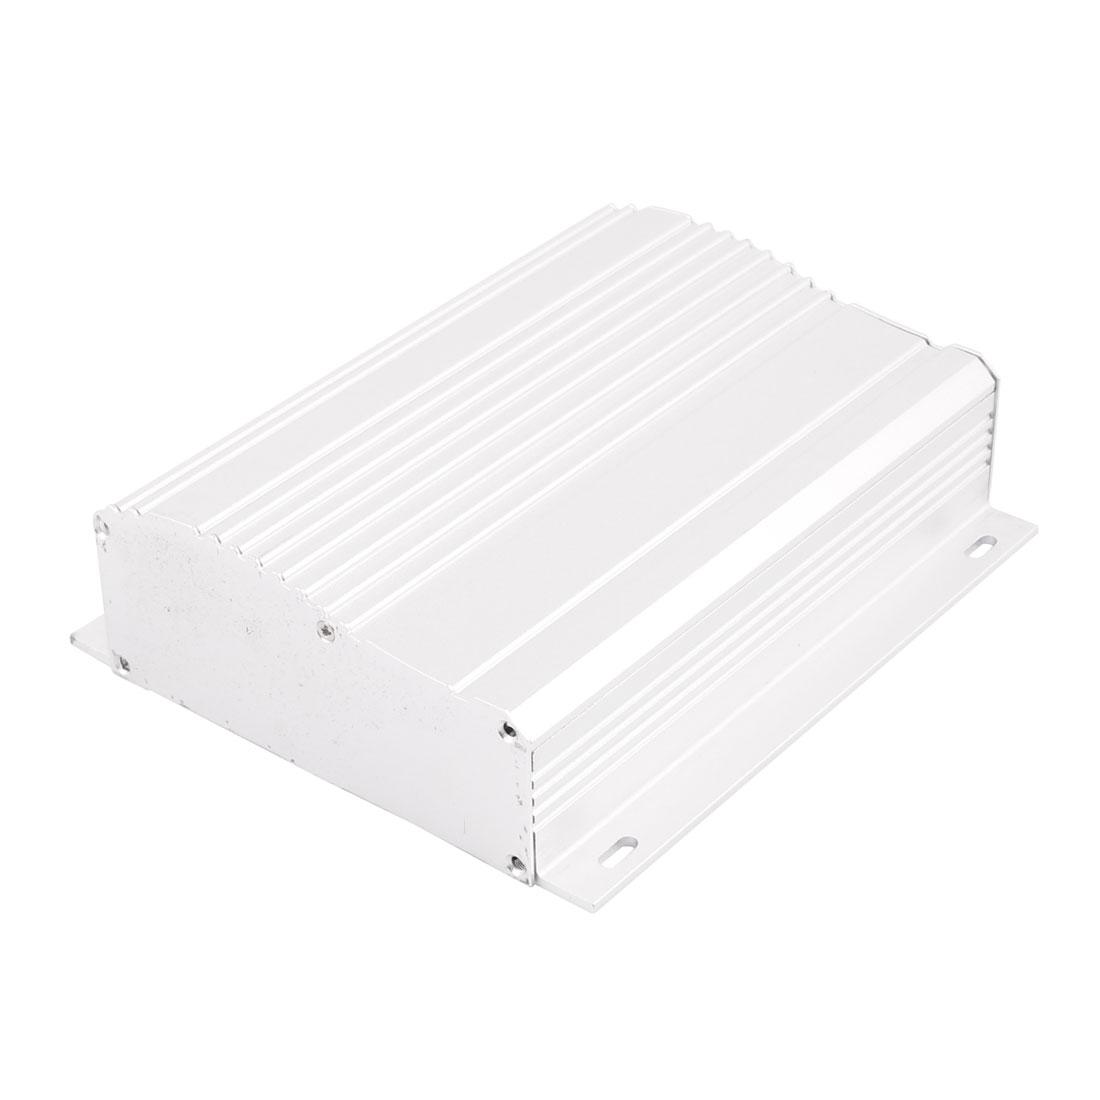 44 x 138 x 160mm Multi-purpose Electronic Extruded Aluminum Enclosure Case Silver Tone